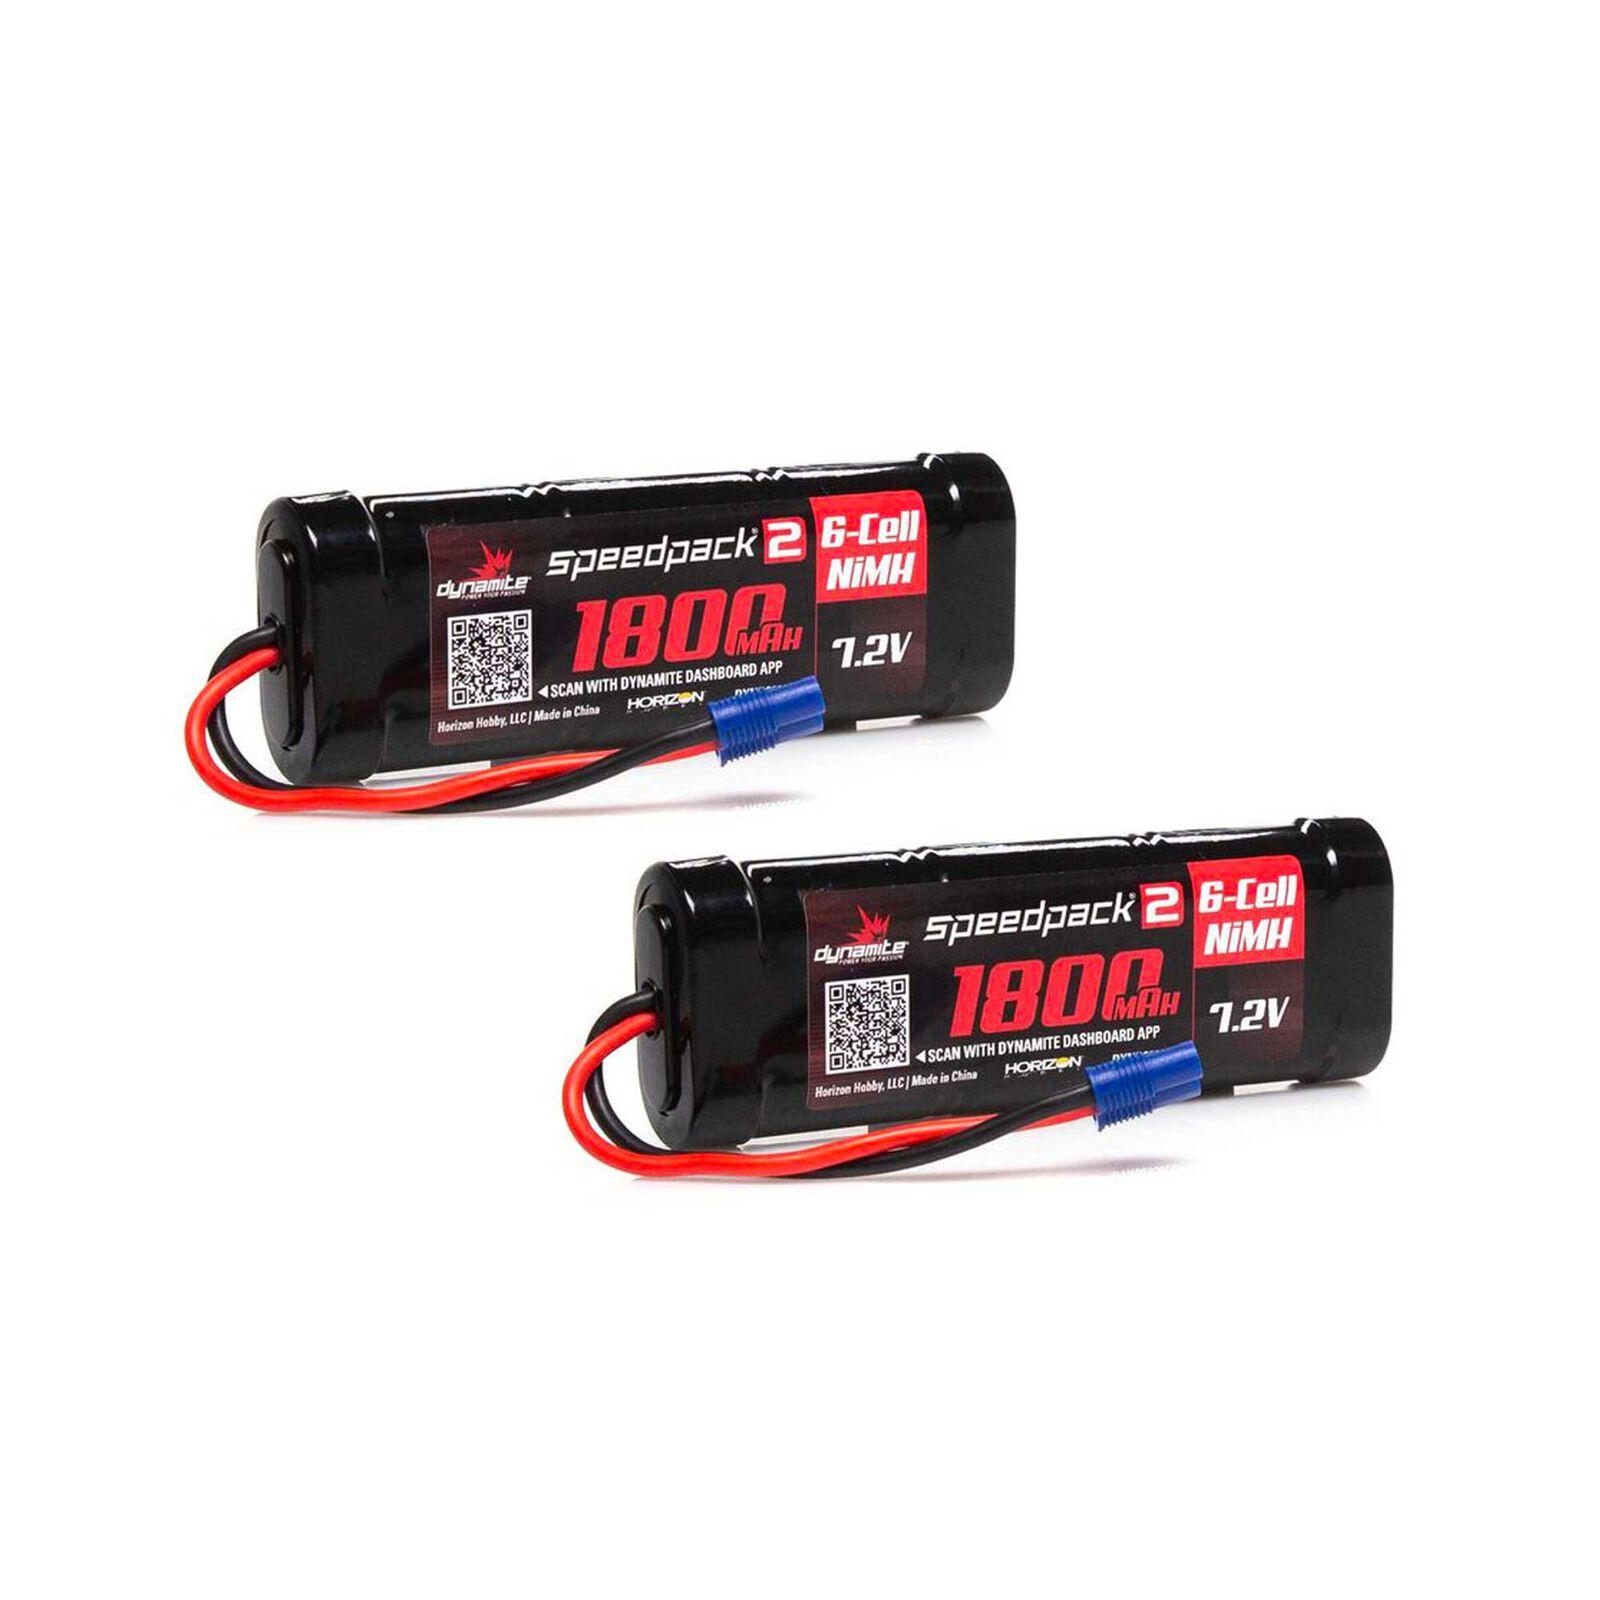 7.2V 1800mAh 6 Cell Flat NiMH Speedpack2 Battery: EC3 (2)